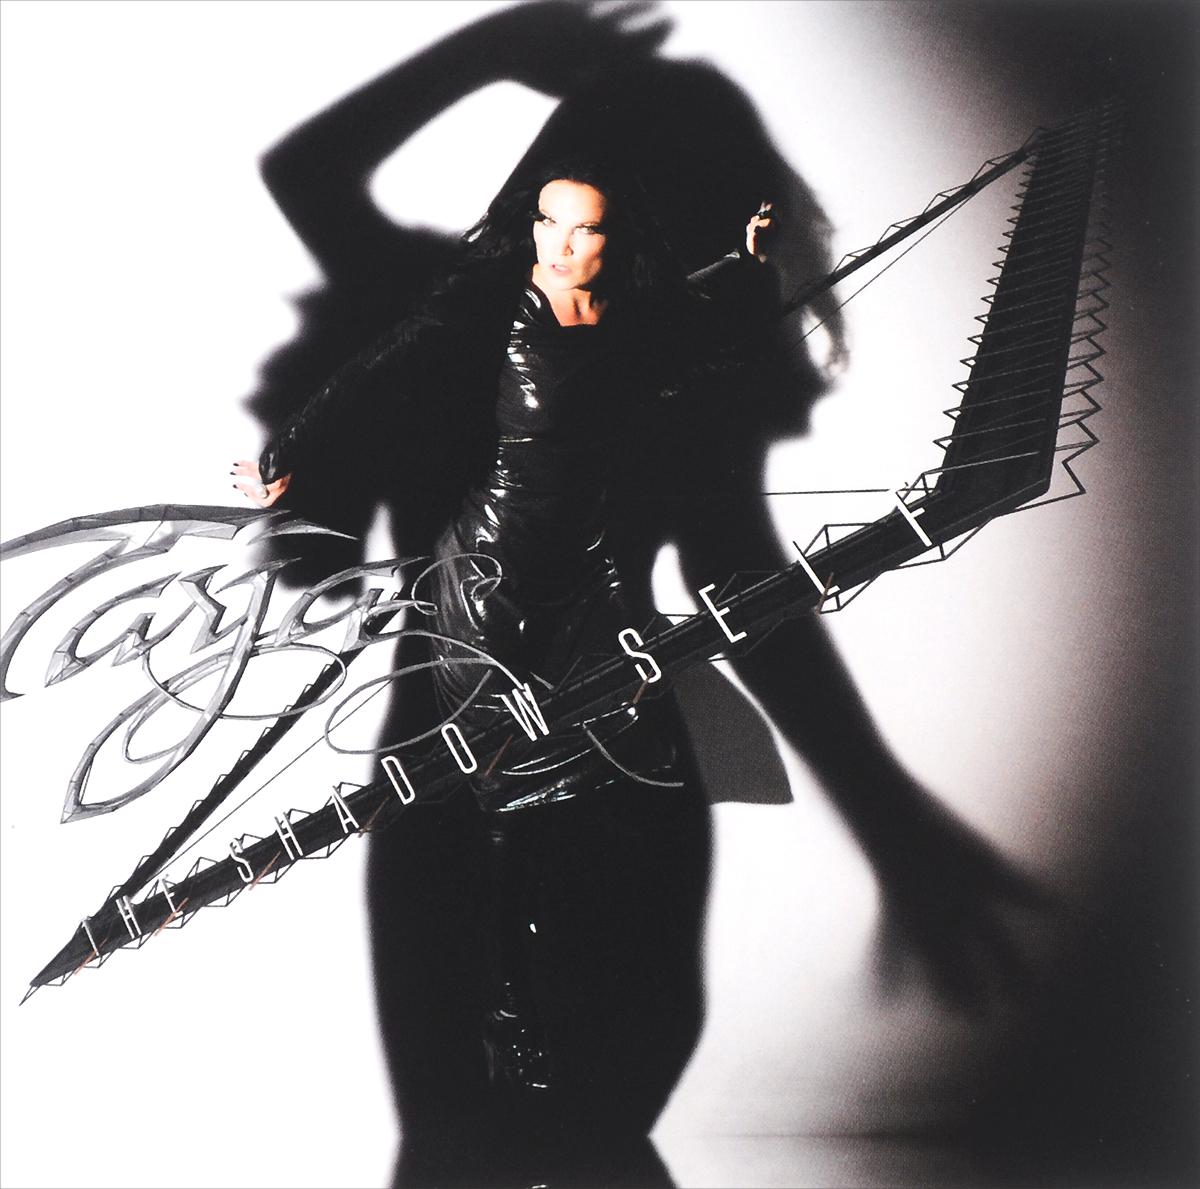 Tarja. The Shadow Self